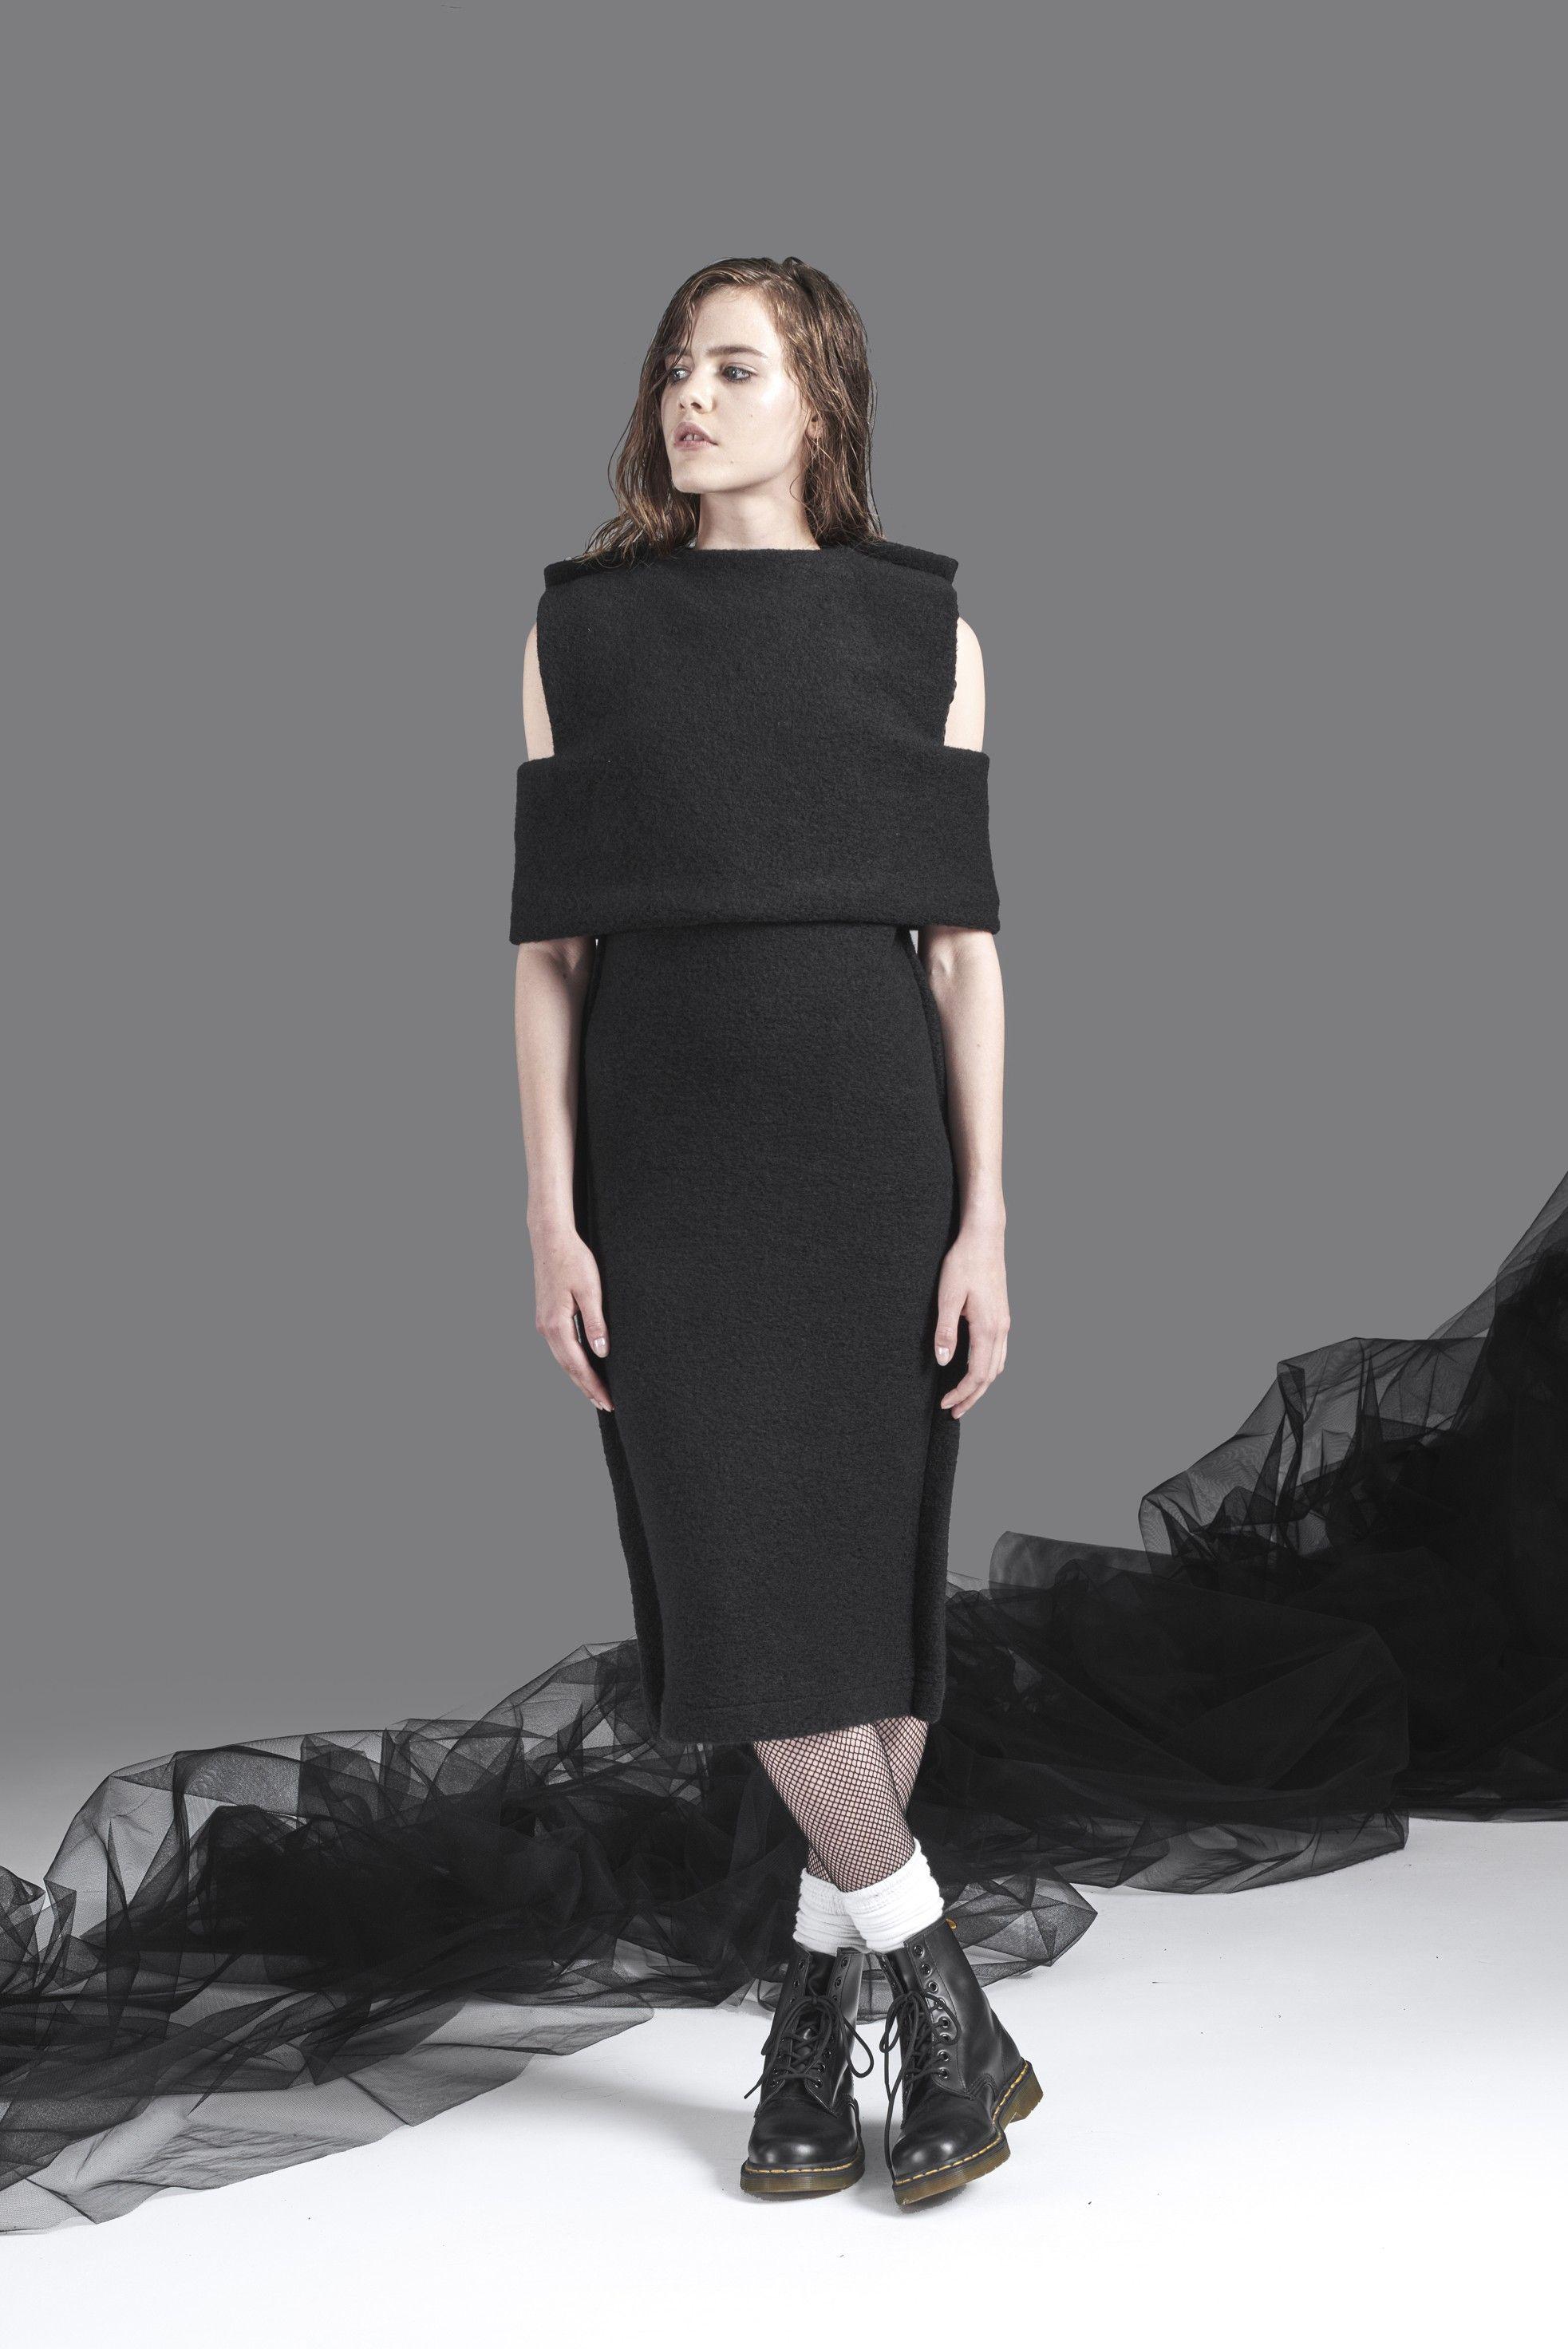 Dress #7 | Serafin Andrzejak | NOT JUST A LABEL